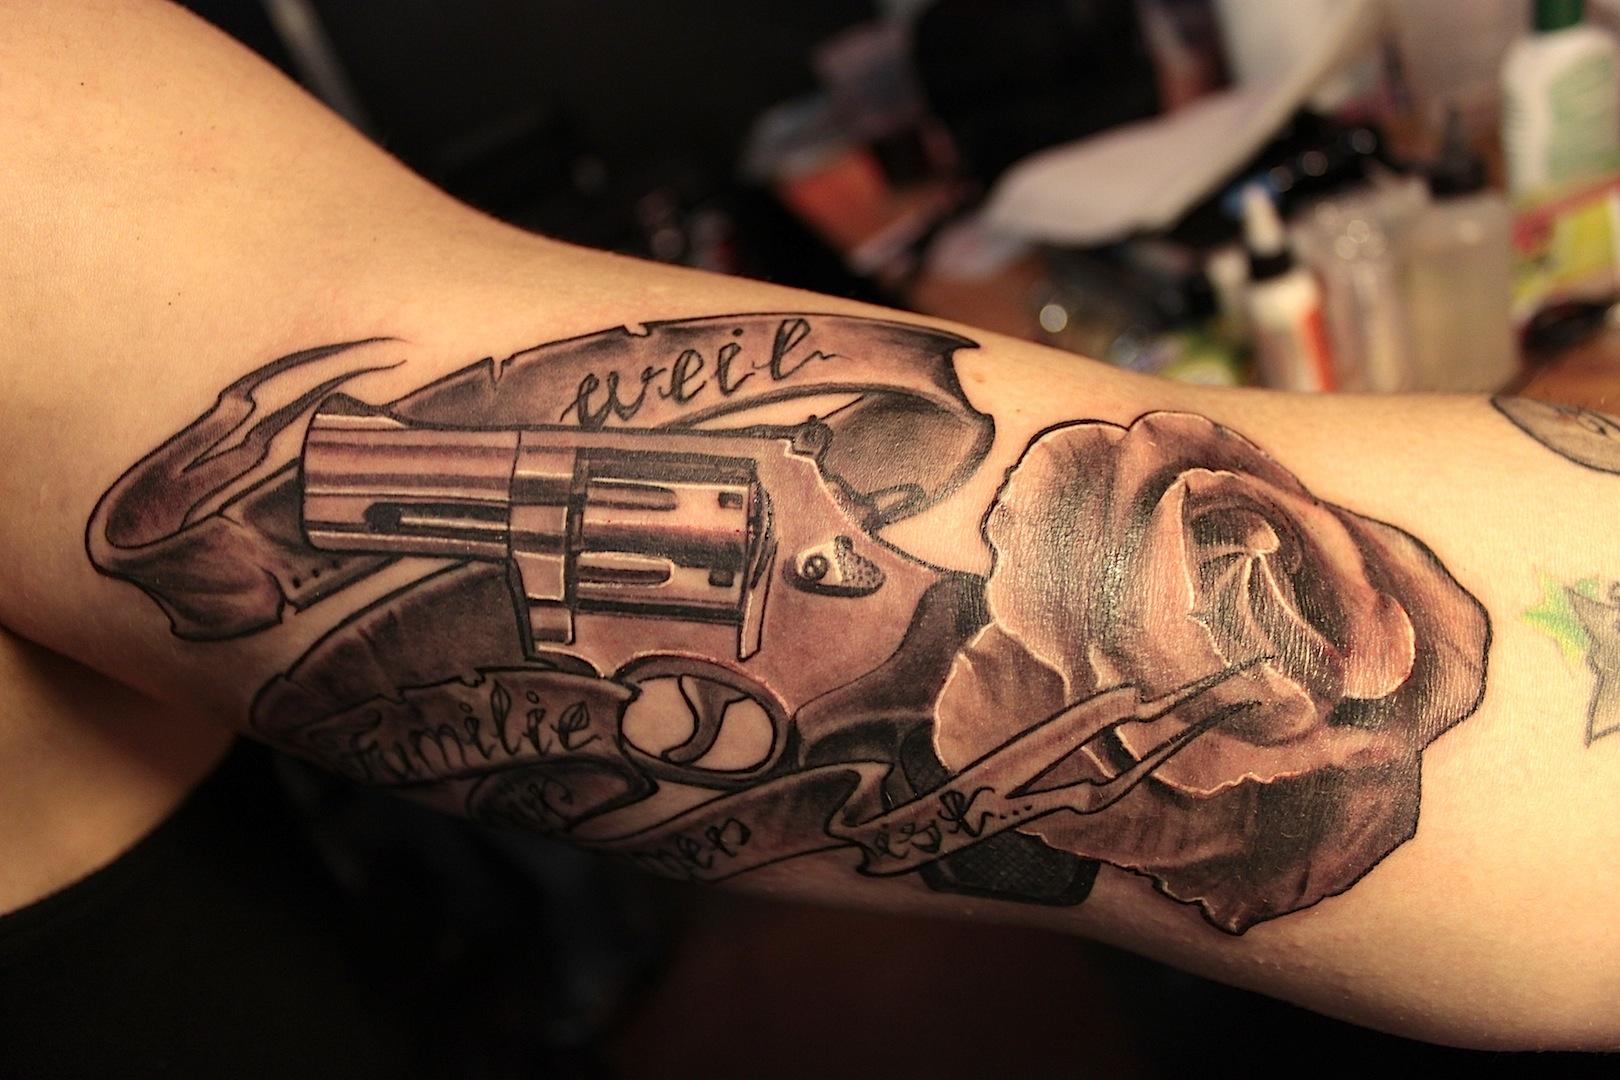 electrographic,tattoo,rosenheim,tattoo convention,münchen.1